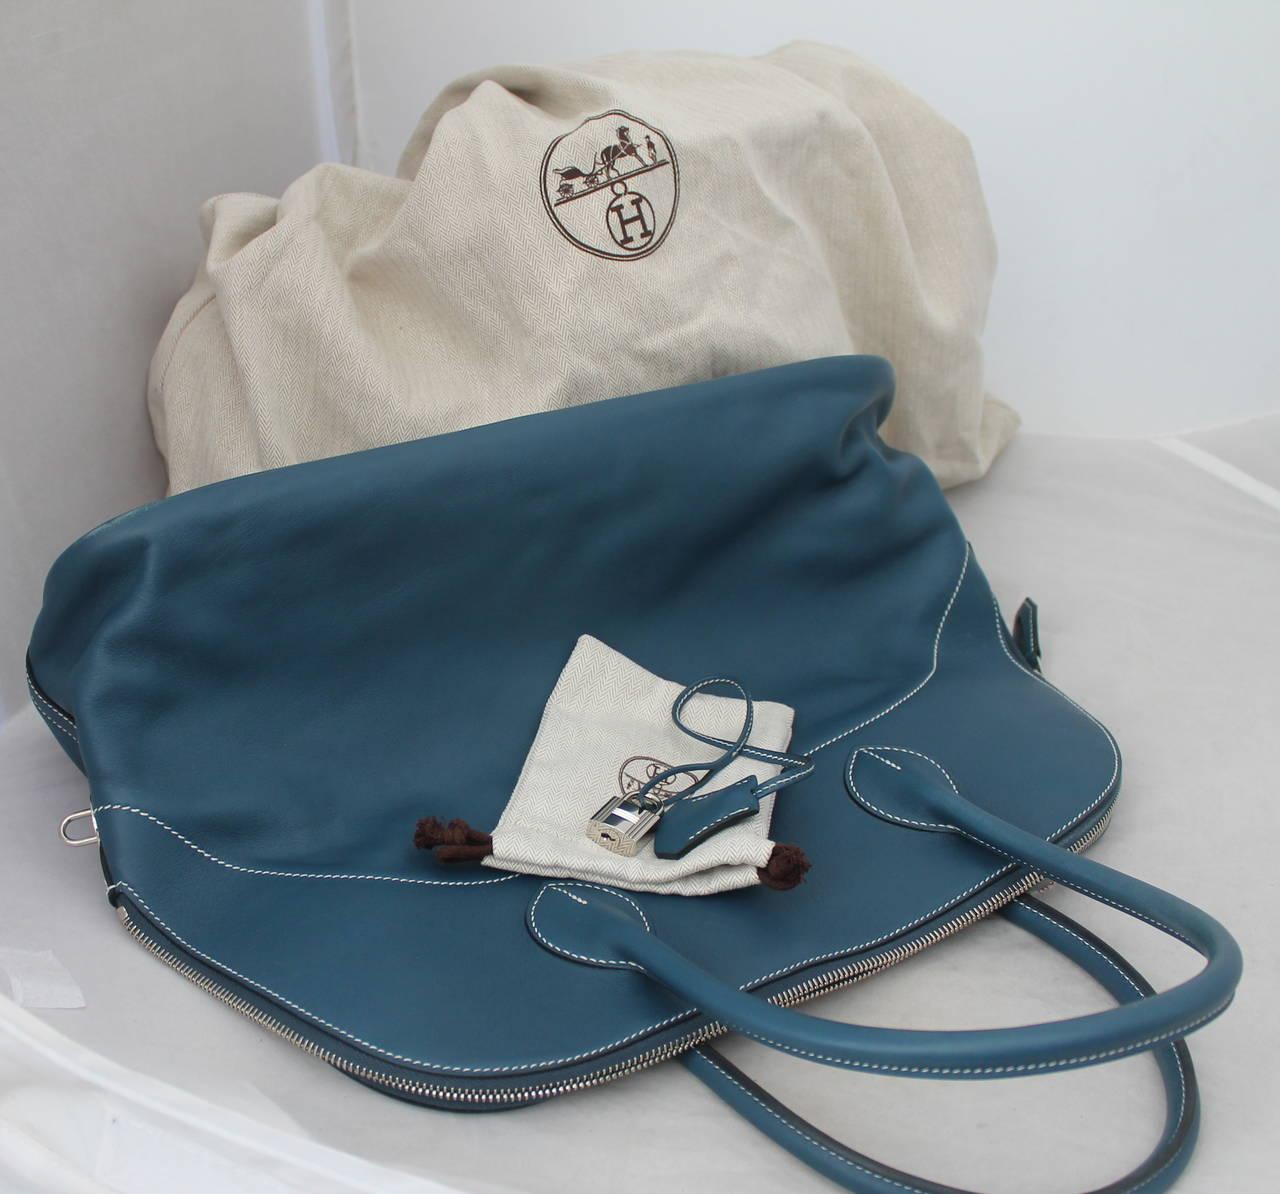 Women's Hermes Thalassa Blue 40cm Veau Swift Bolide Handbag circa 2012 For Sale